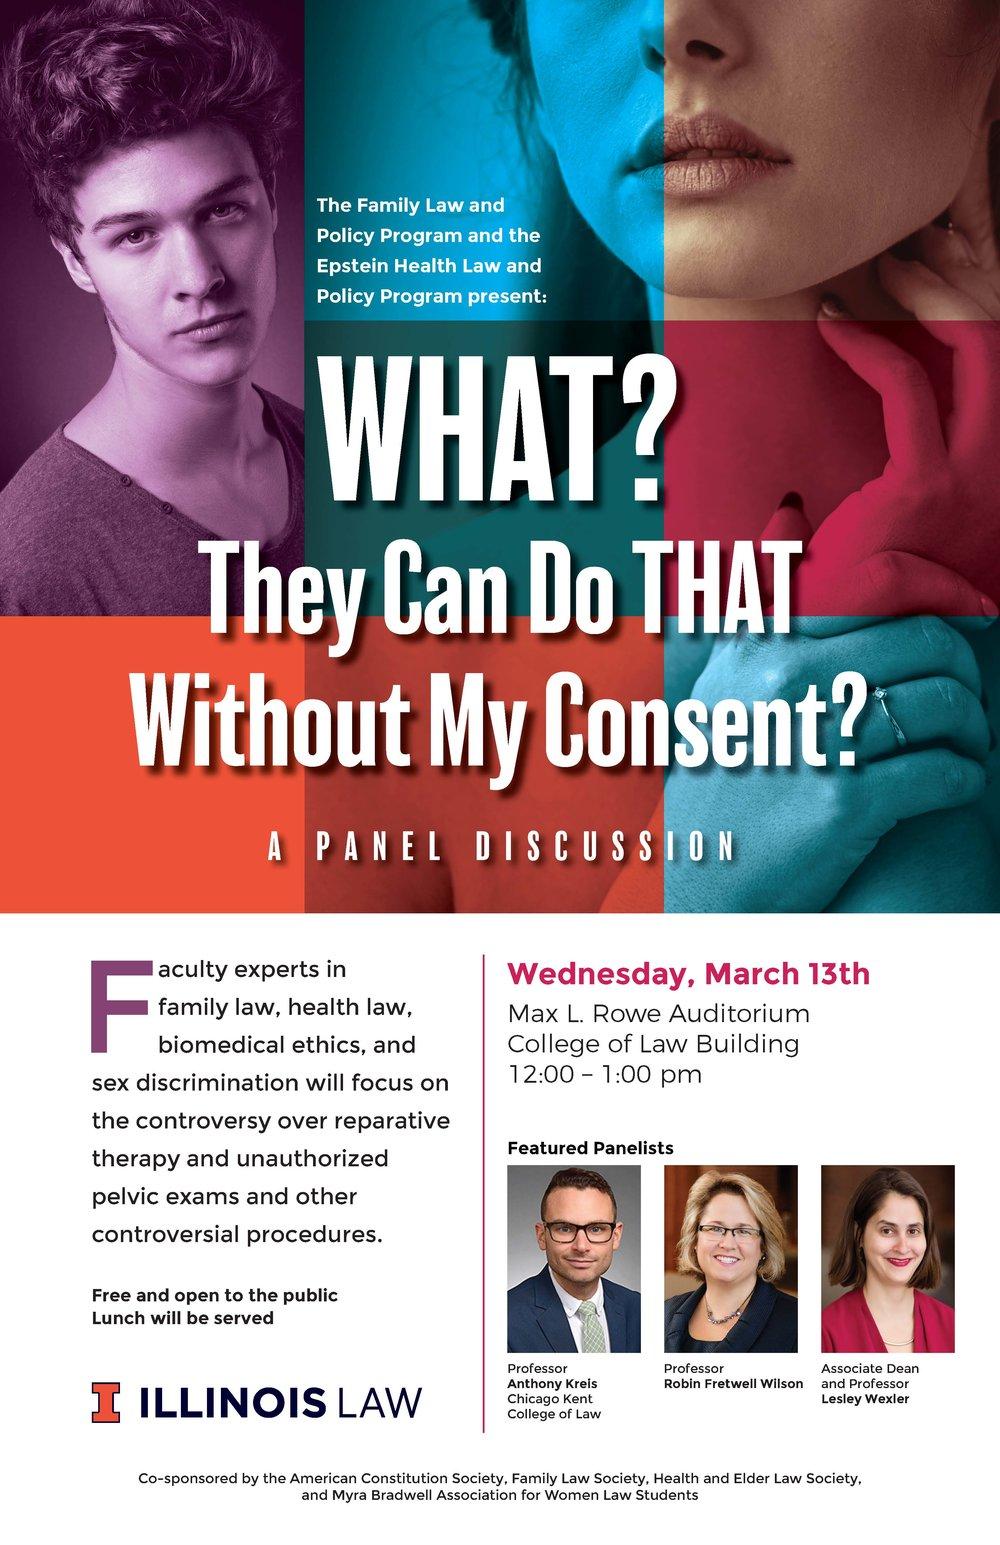 Consent_Panel_discussion_3_p4.jpg